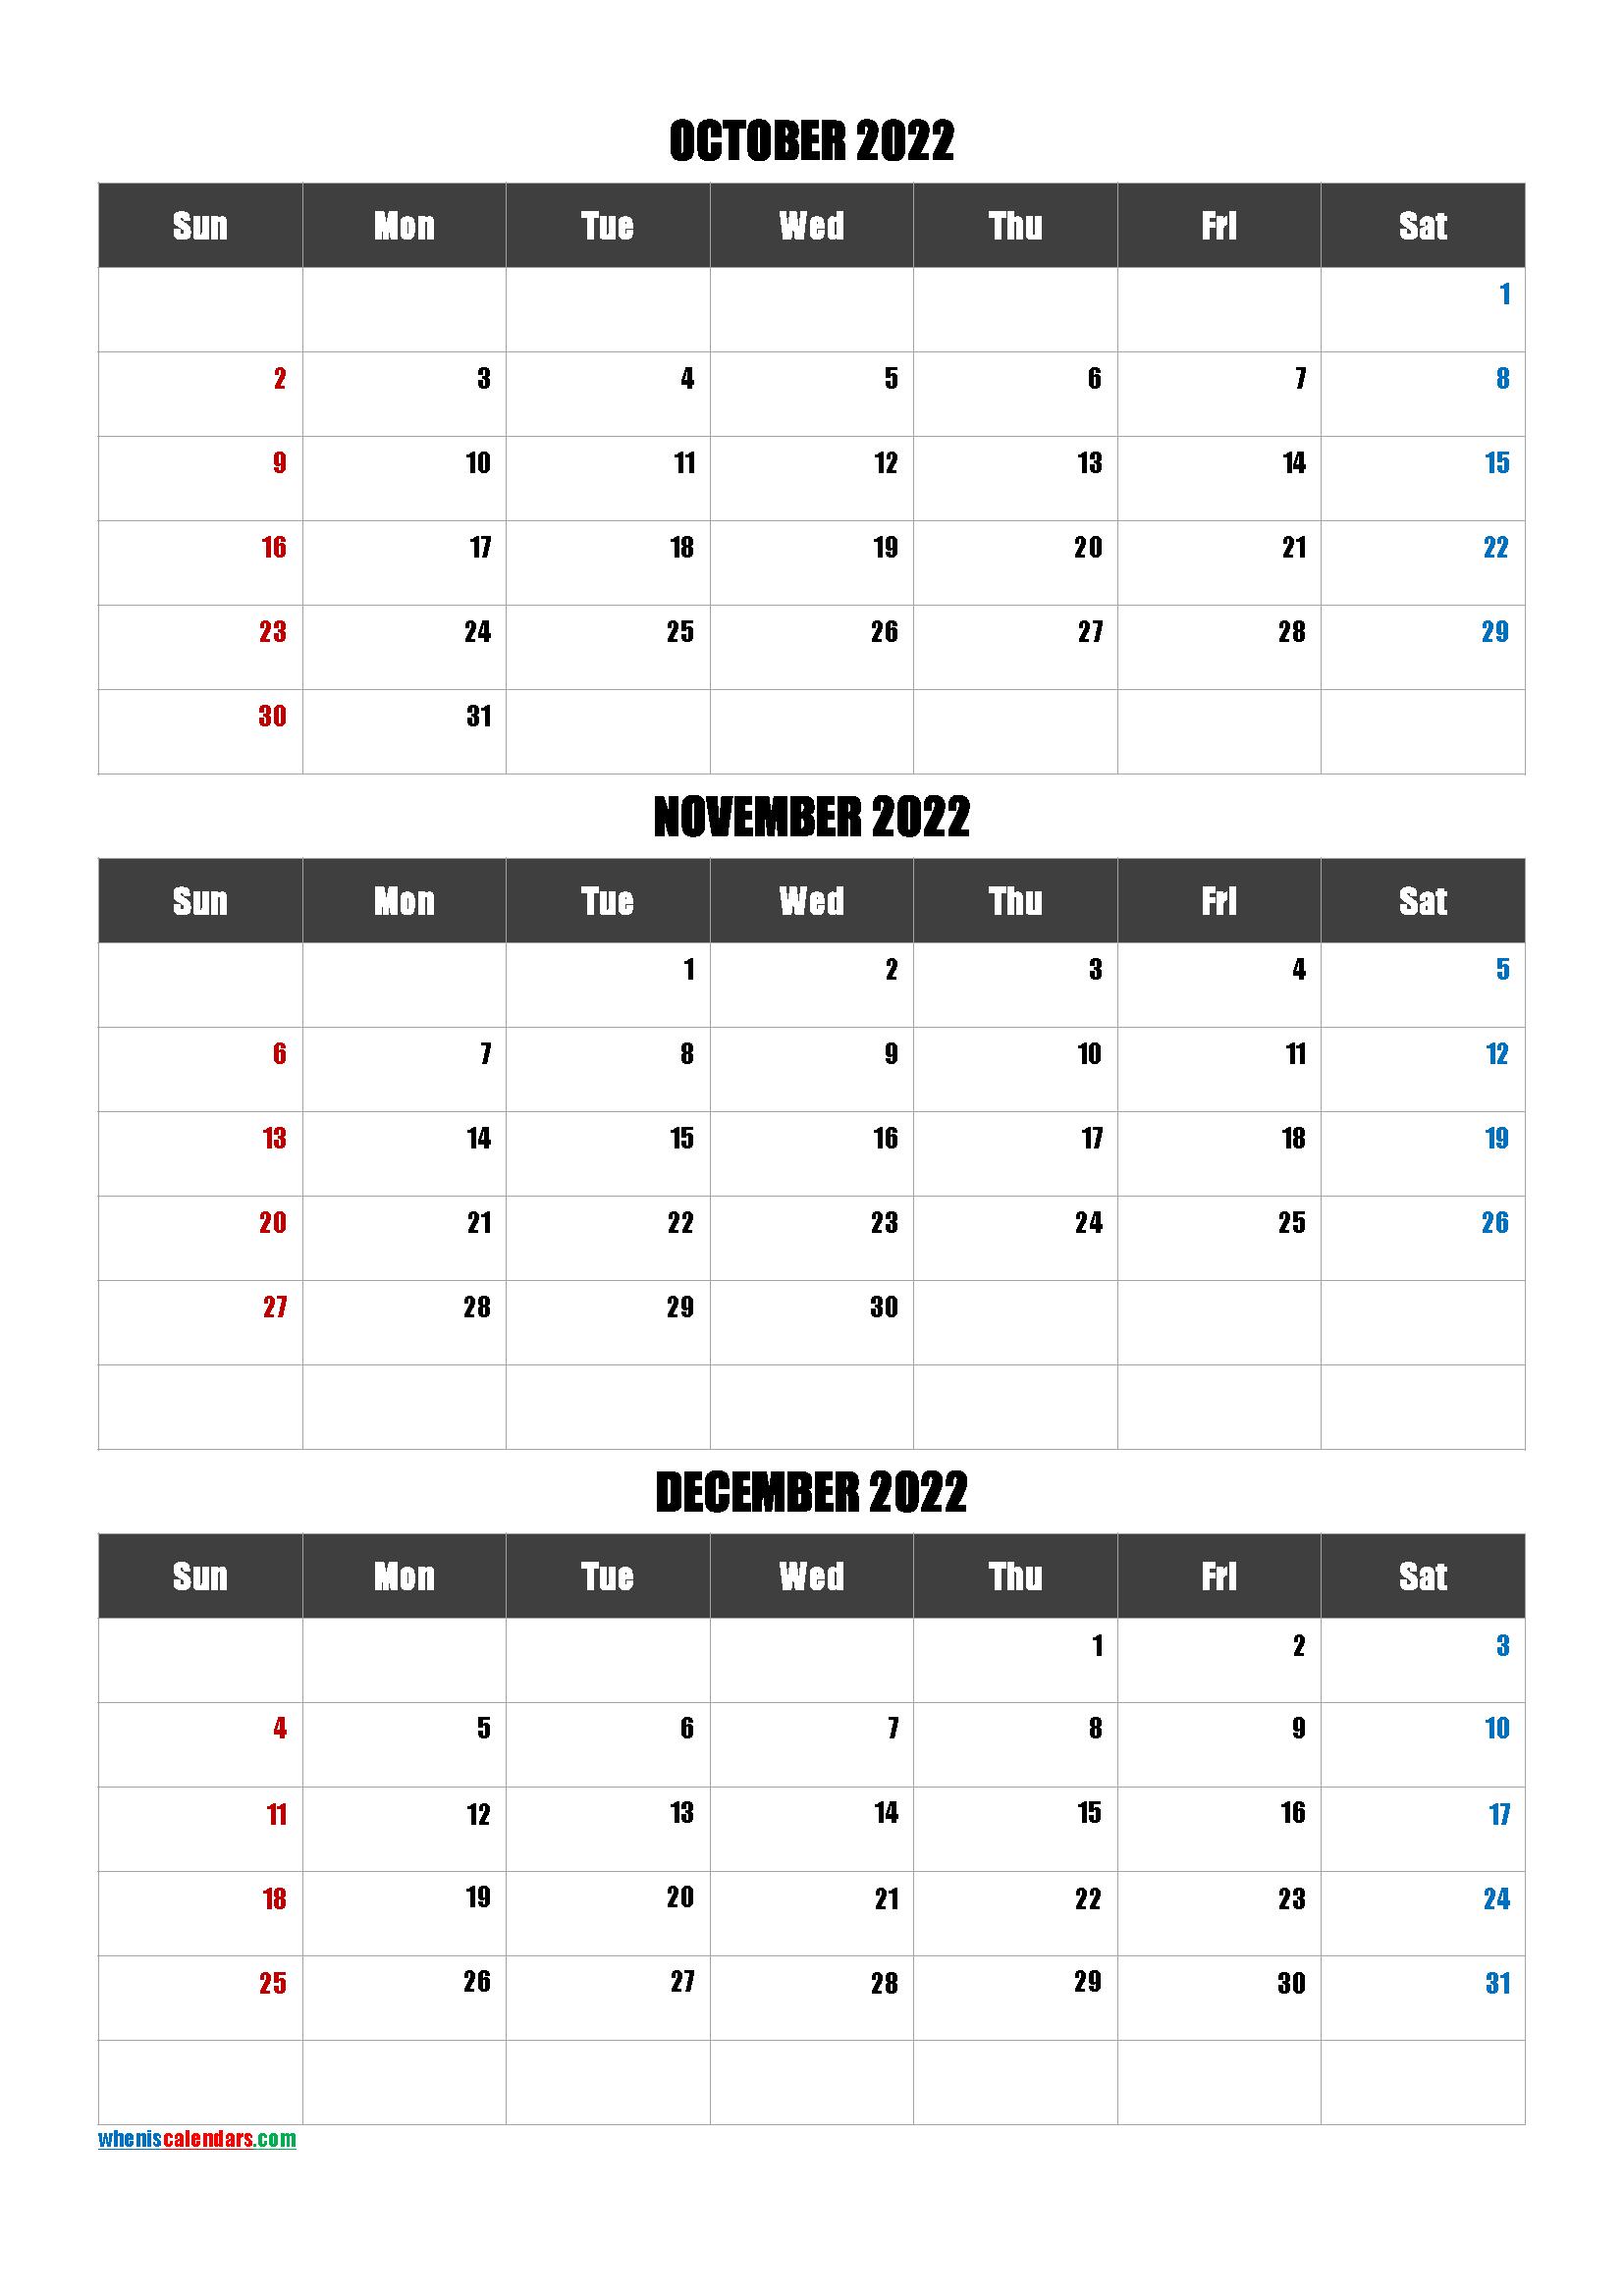 Free Printable 3 Month Calendar2022 October November December